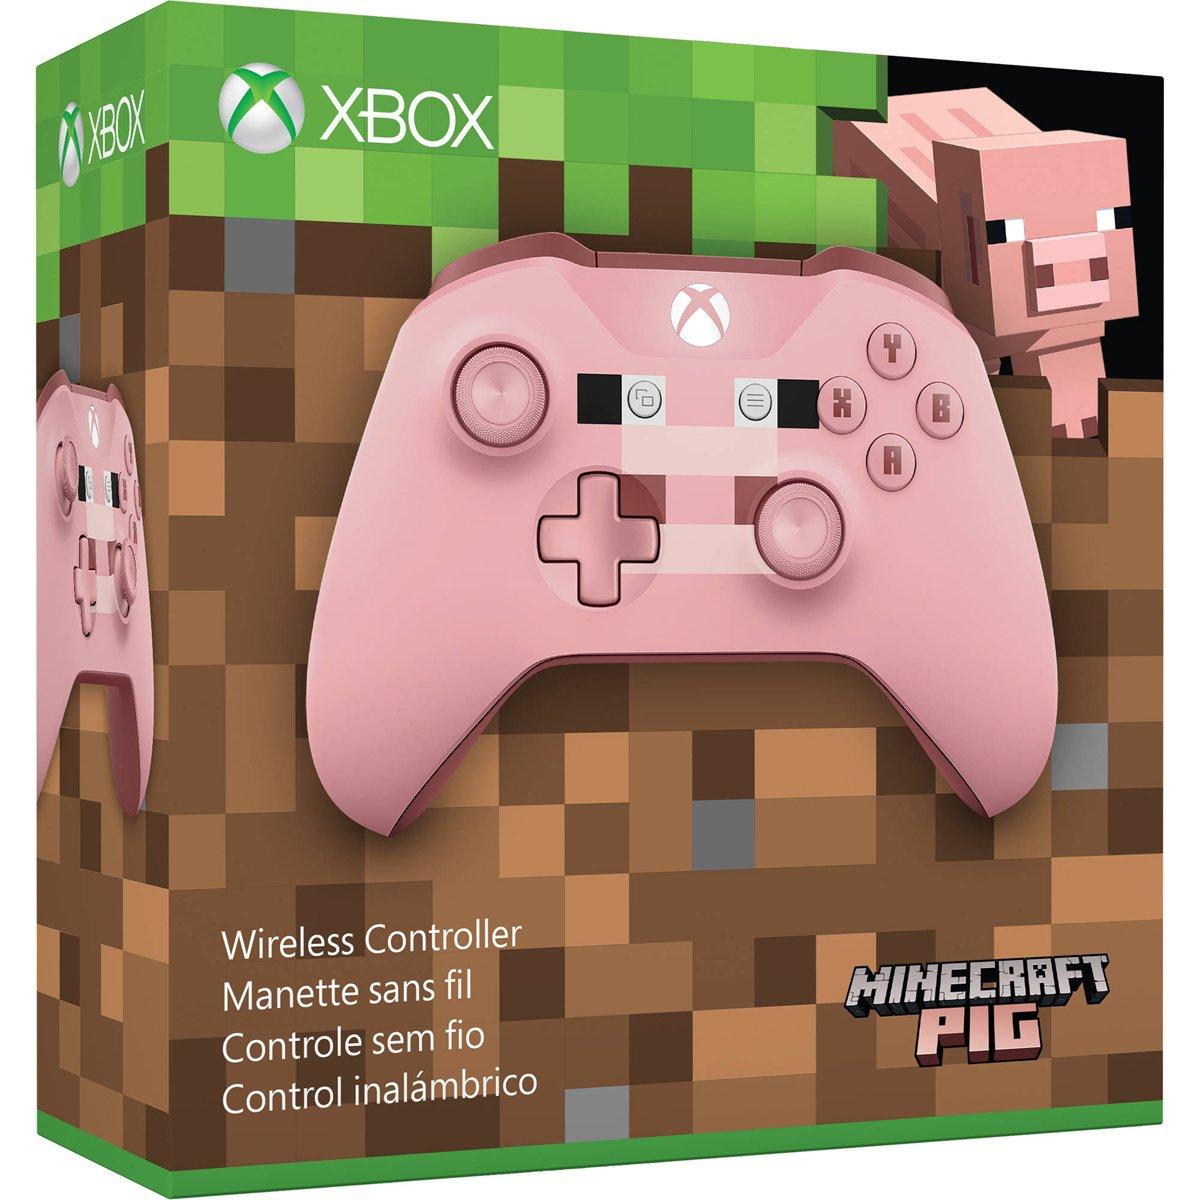 Amazon.com: Microsoft Xbox Wireless Controller - Minecraft Pig